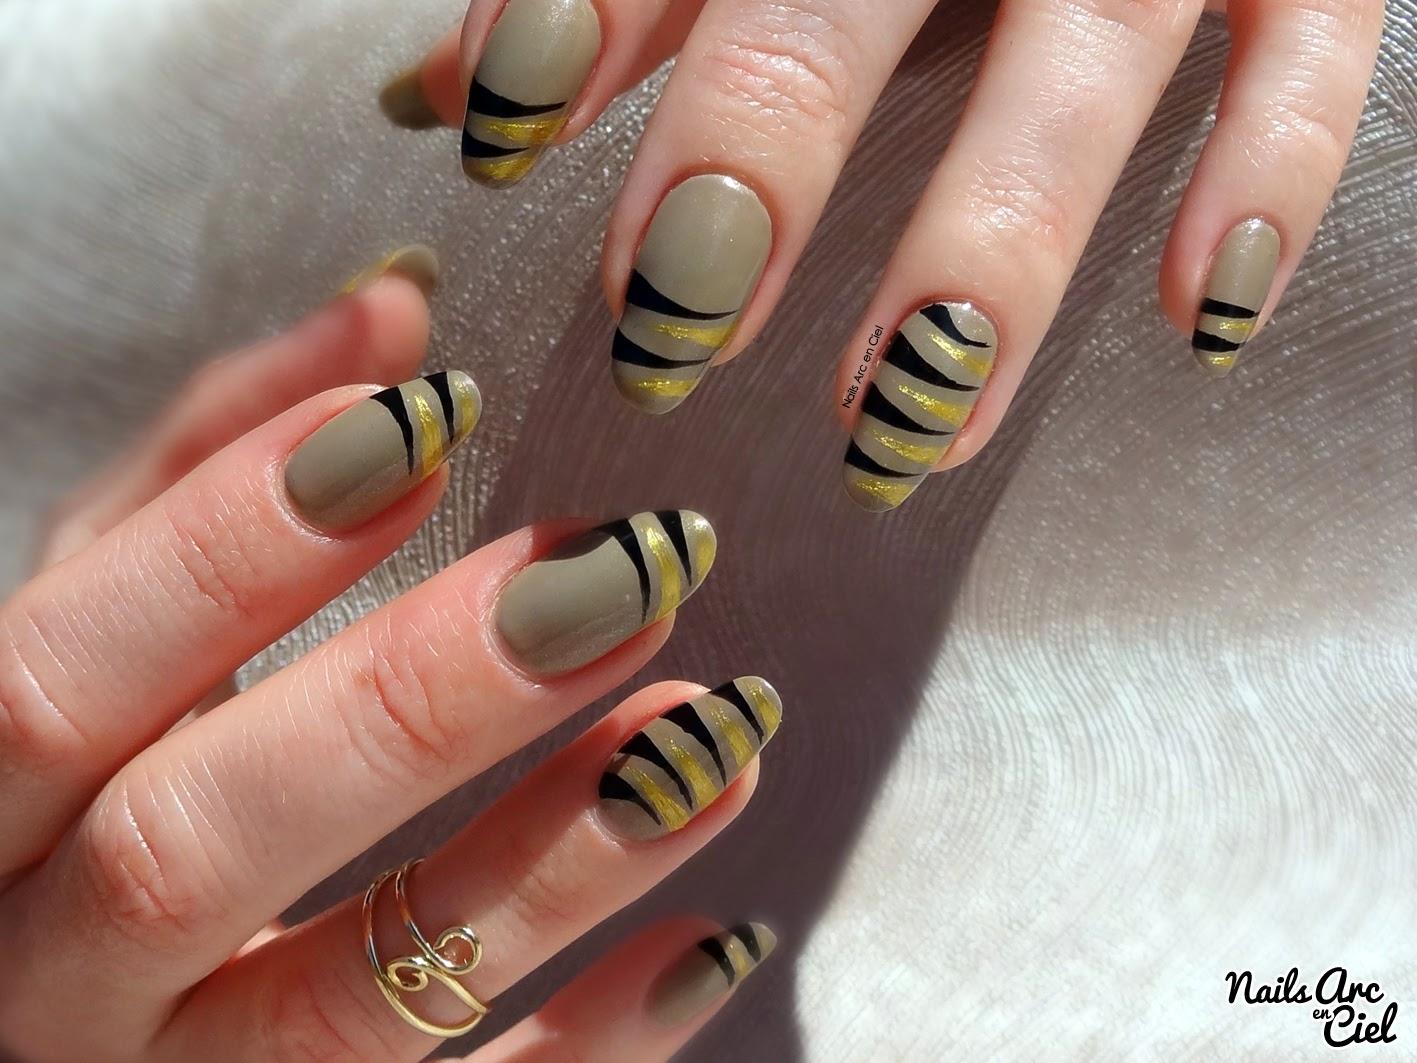 nails arc en ciel tuto nail art tigr facile au liner. Black Bedroom Furniture Sets. Home Design Ideas